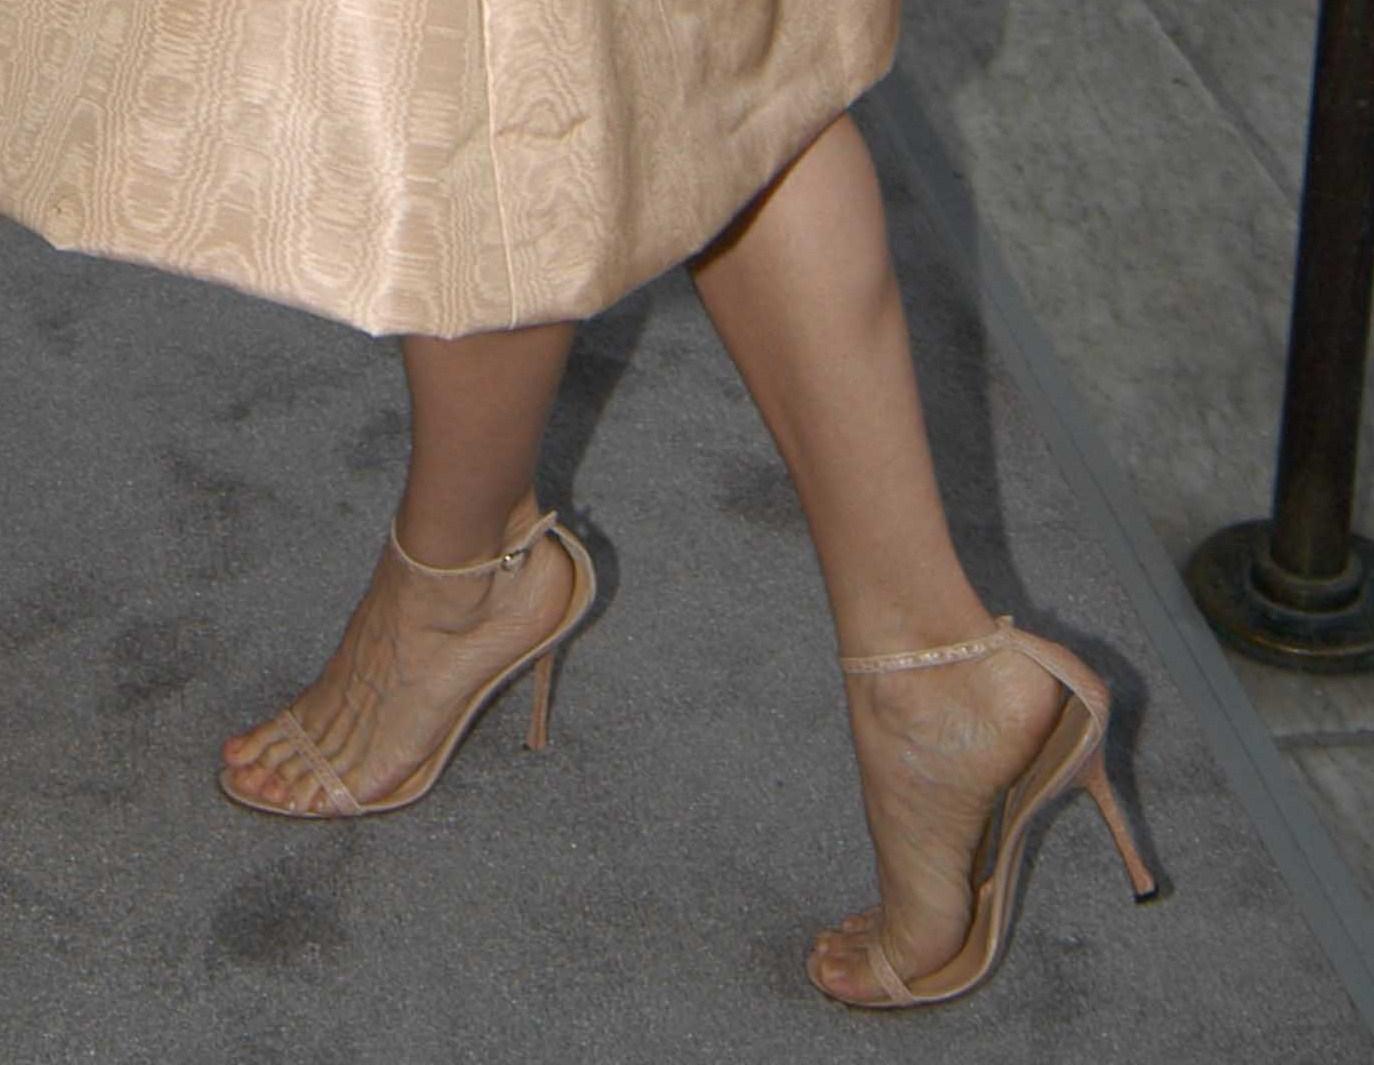 Фото ног звезд 12 фотография